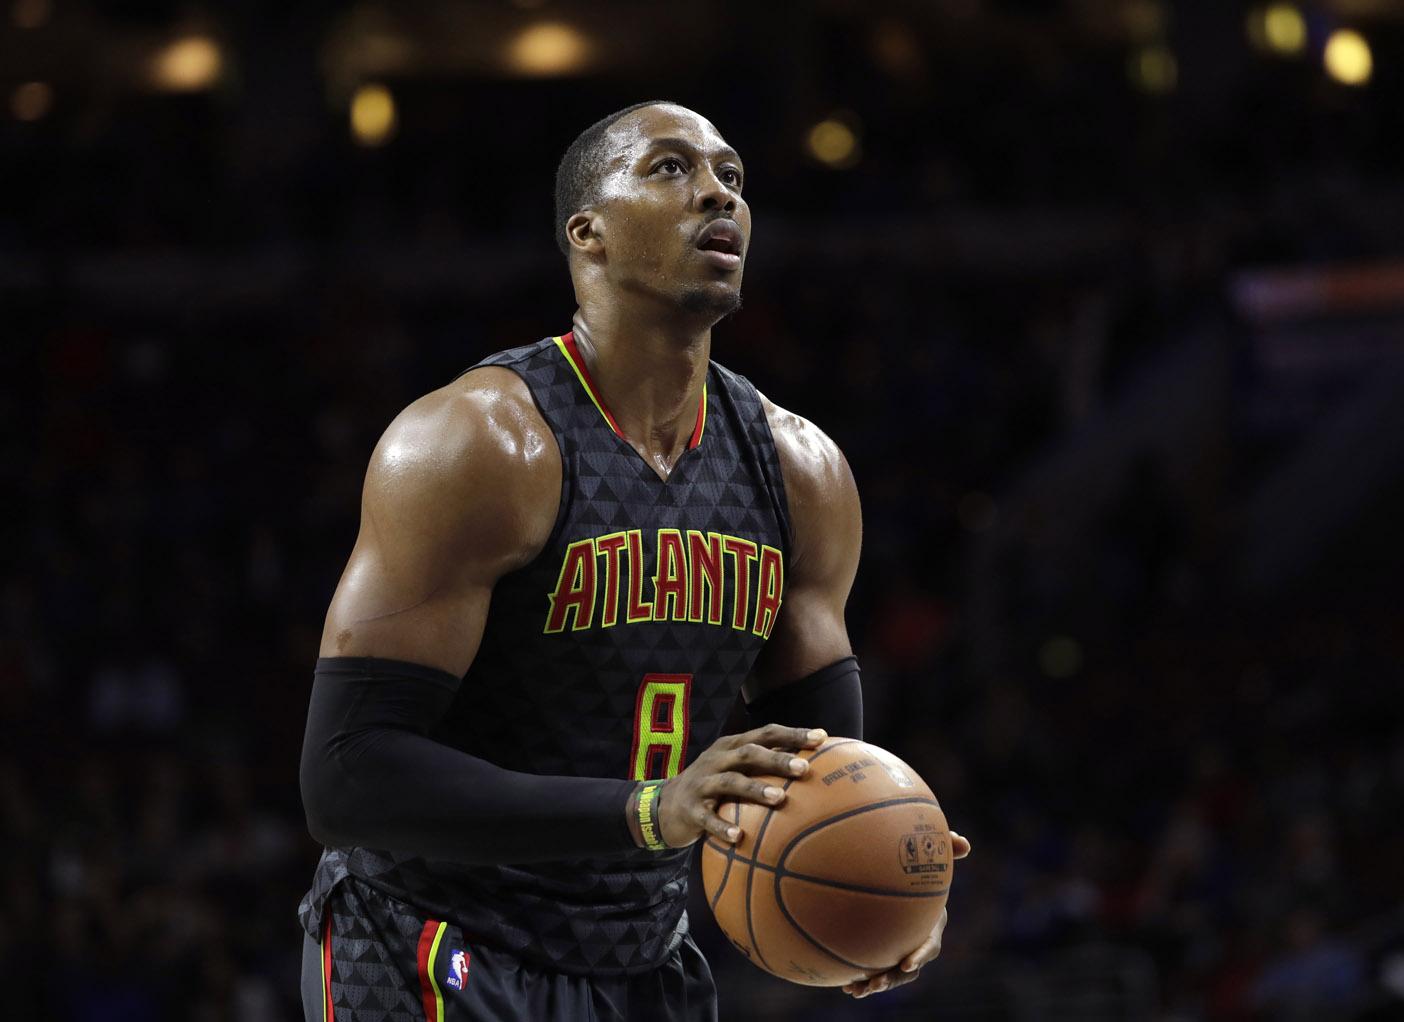 Dwight Howard se muda a Charlotte para jugar con los Hornets